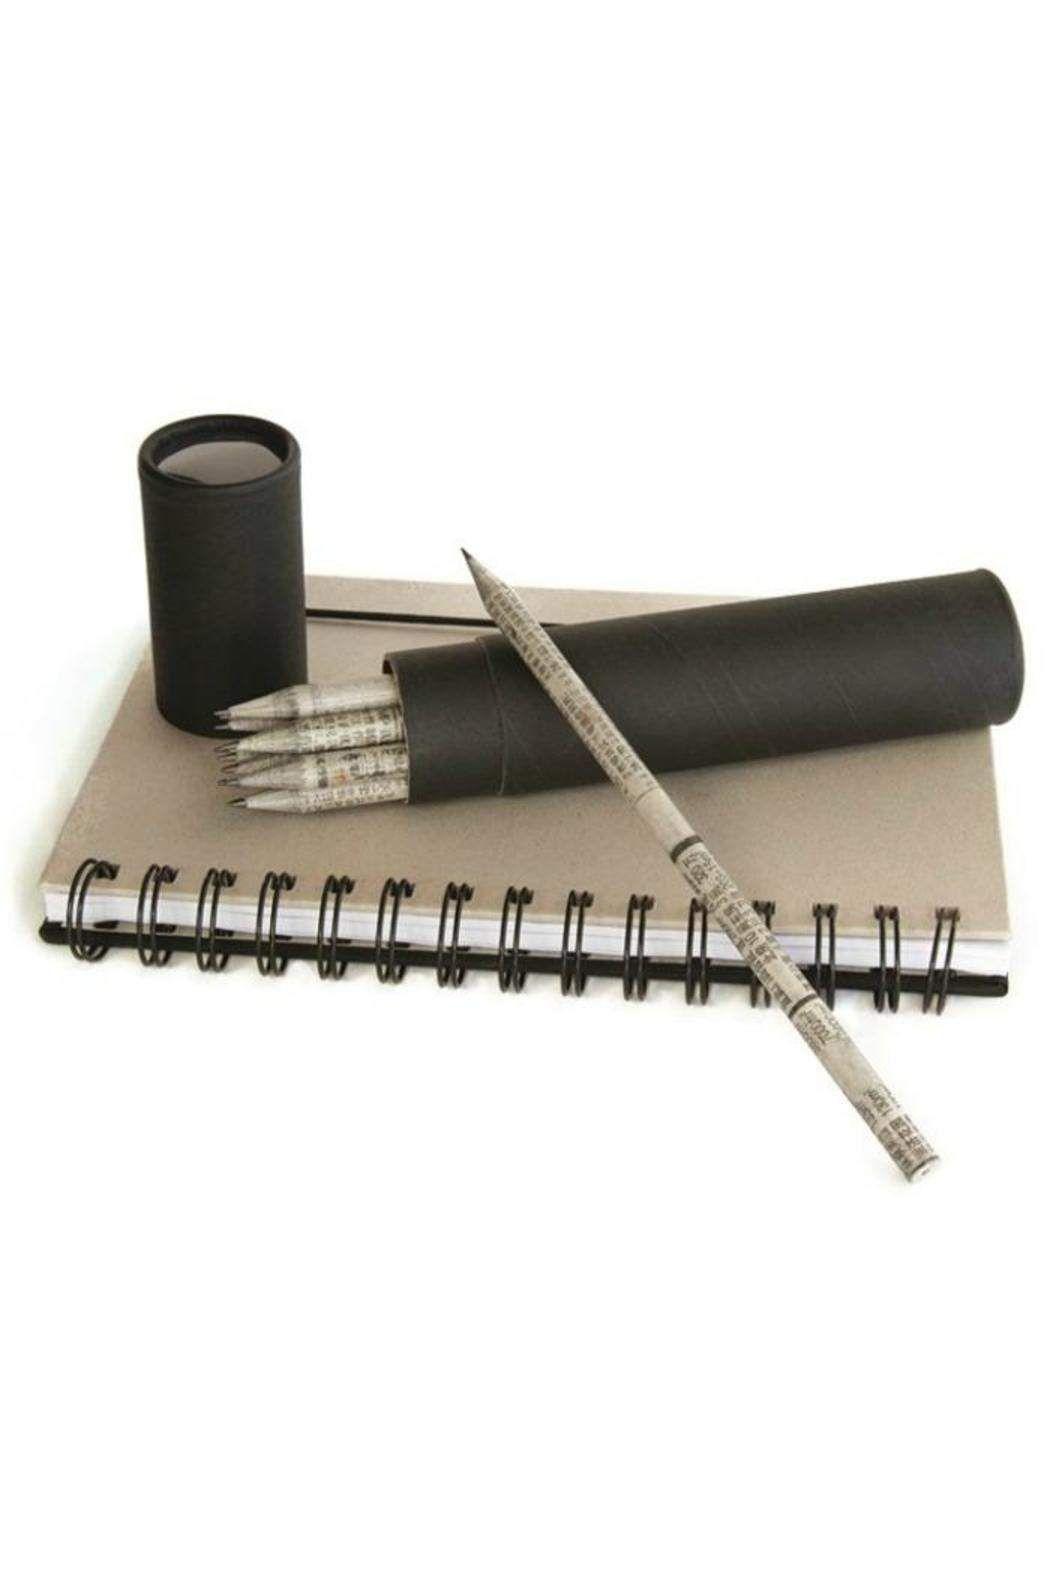 Design Ideas Paper Pencil Set. Office CanadaPencil SharpenerHome GiftsDesign  ...